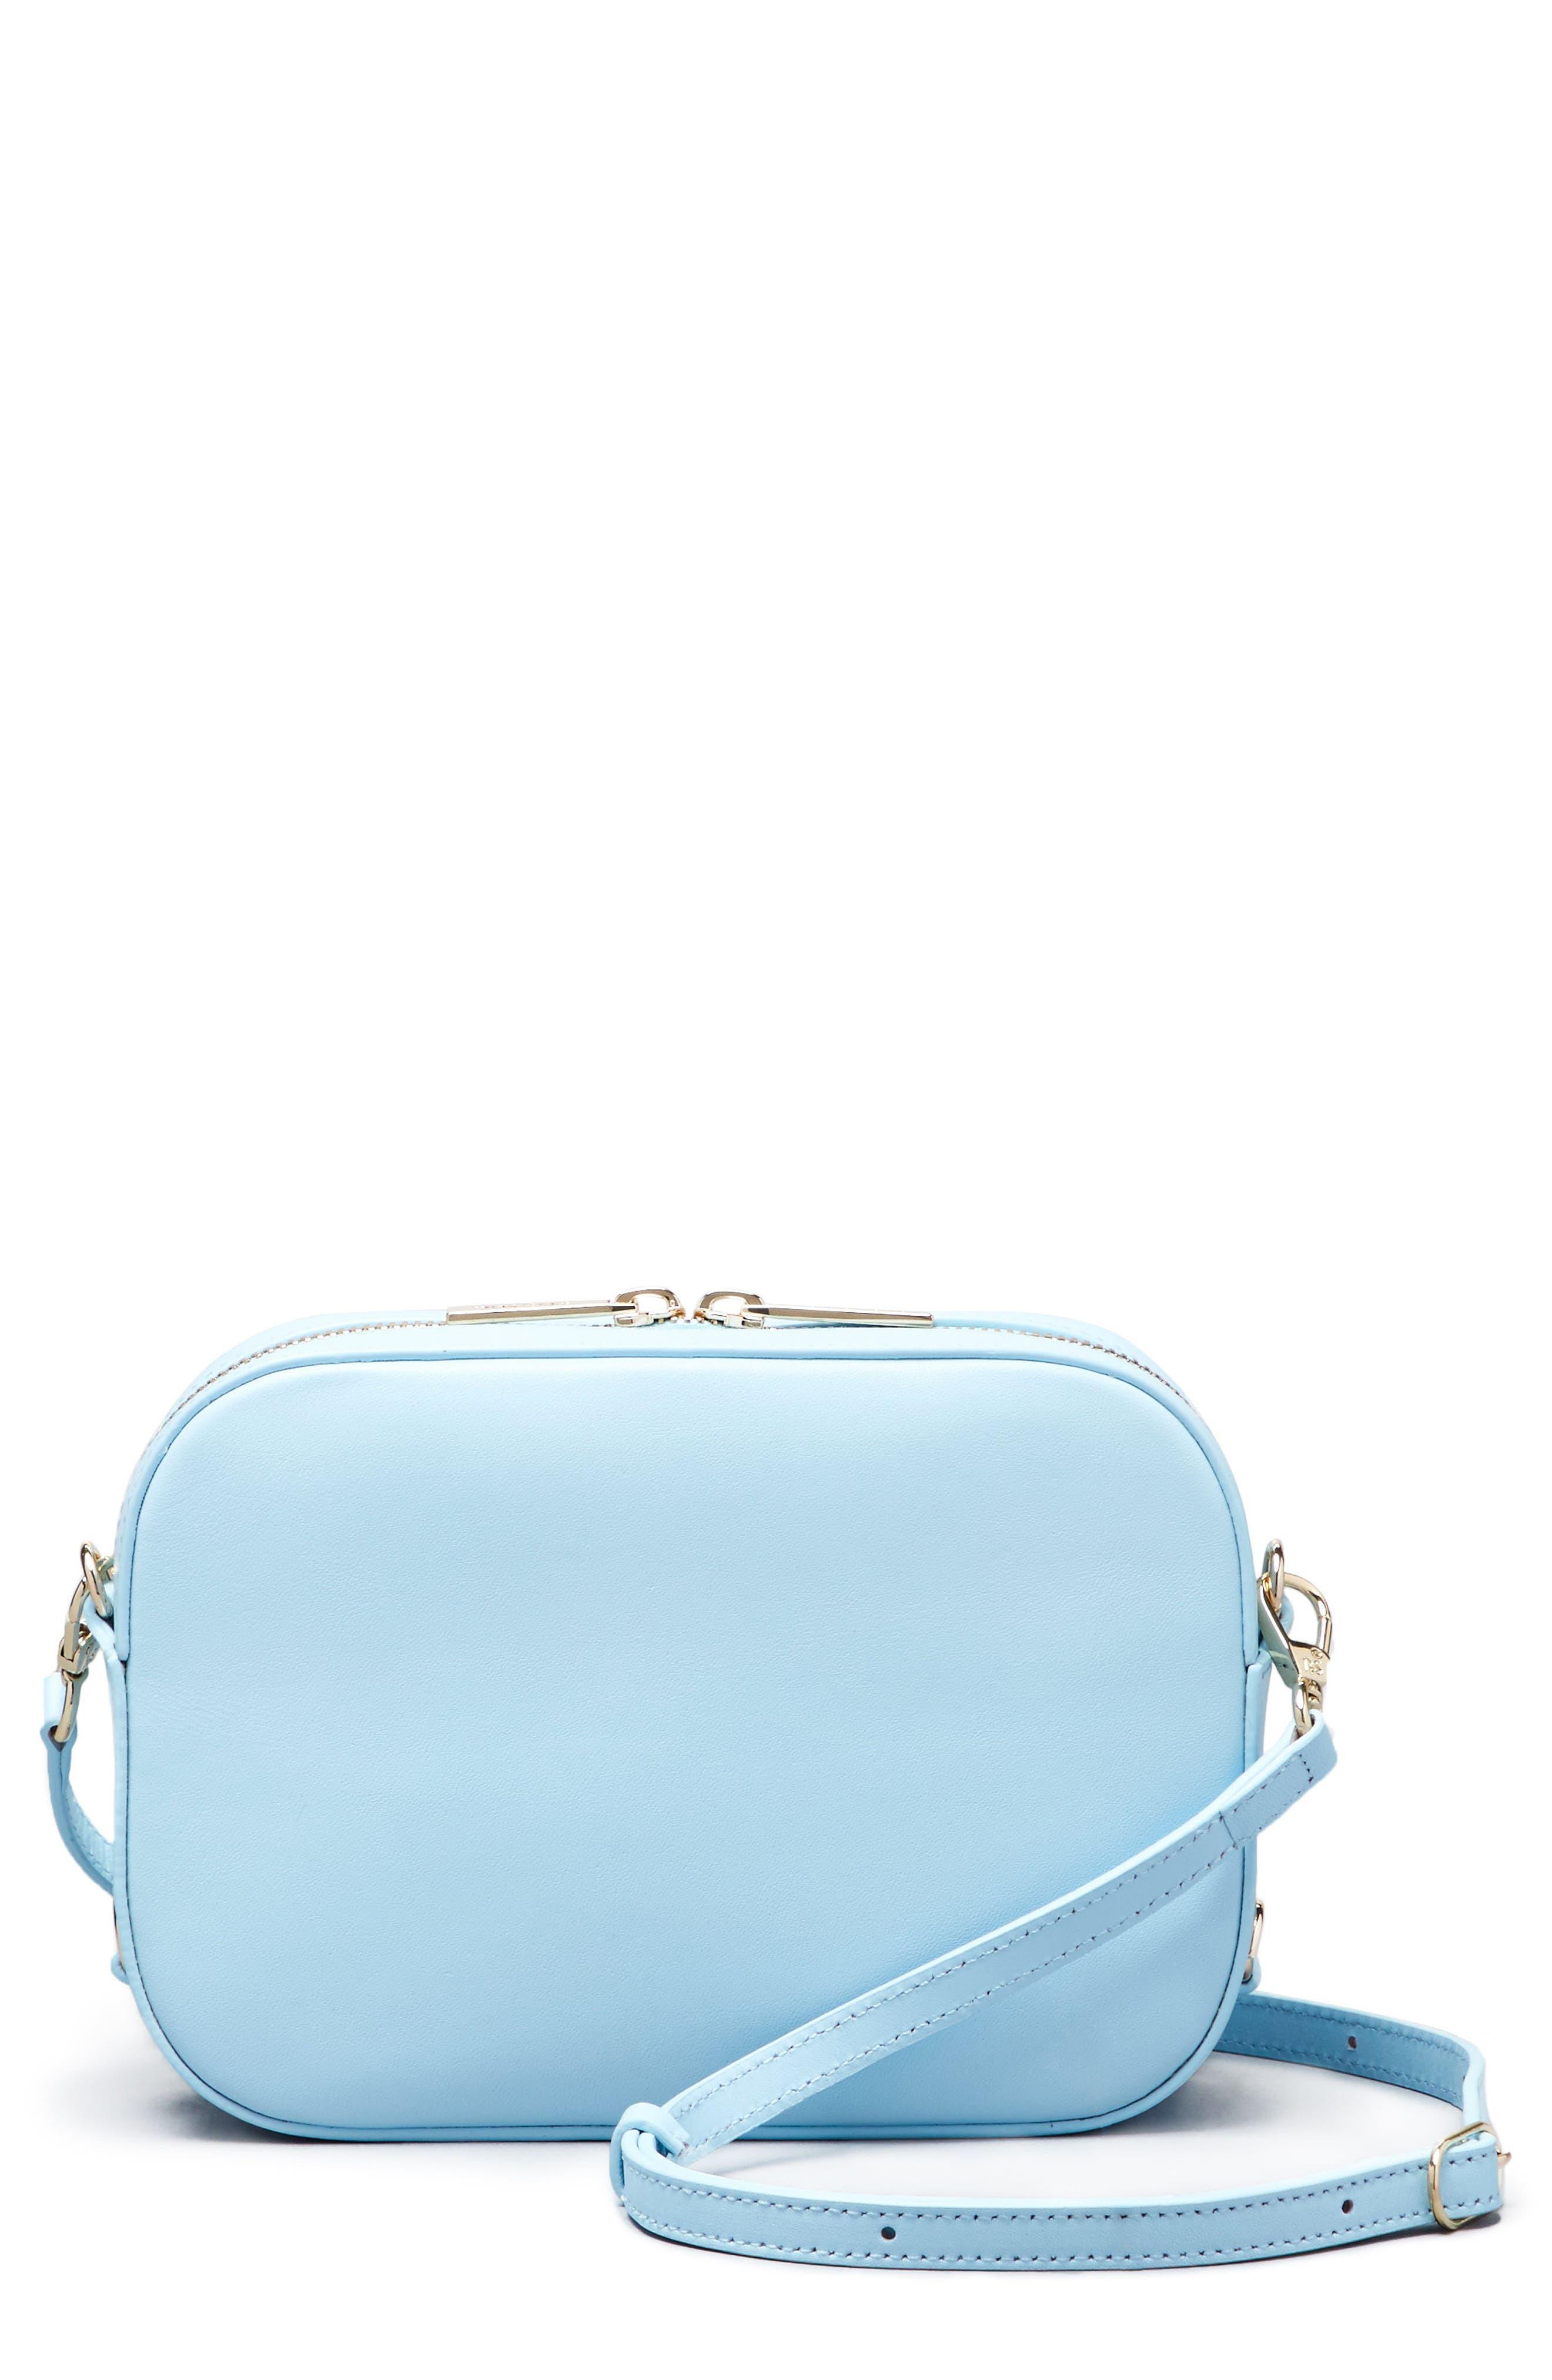 Pop & Suki Bigger Leather Camera Bag (Nordstrom Exclusive)